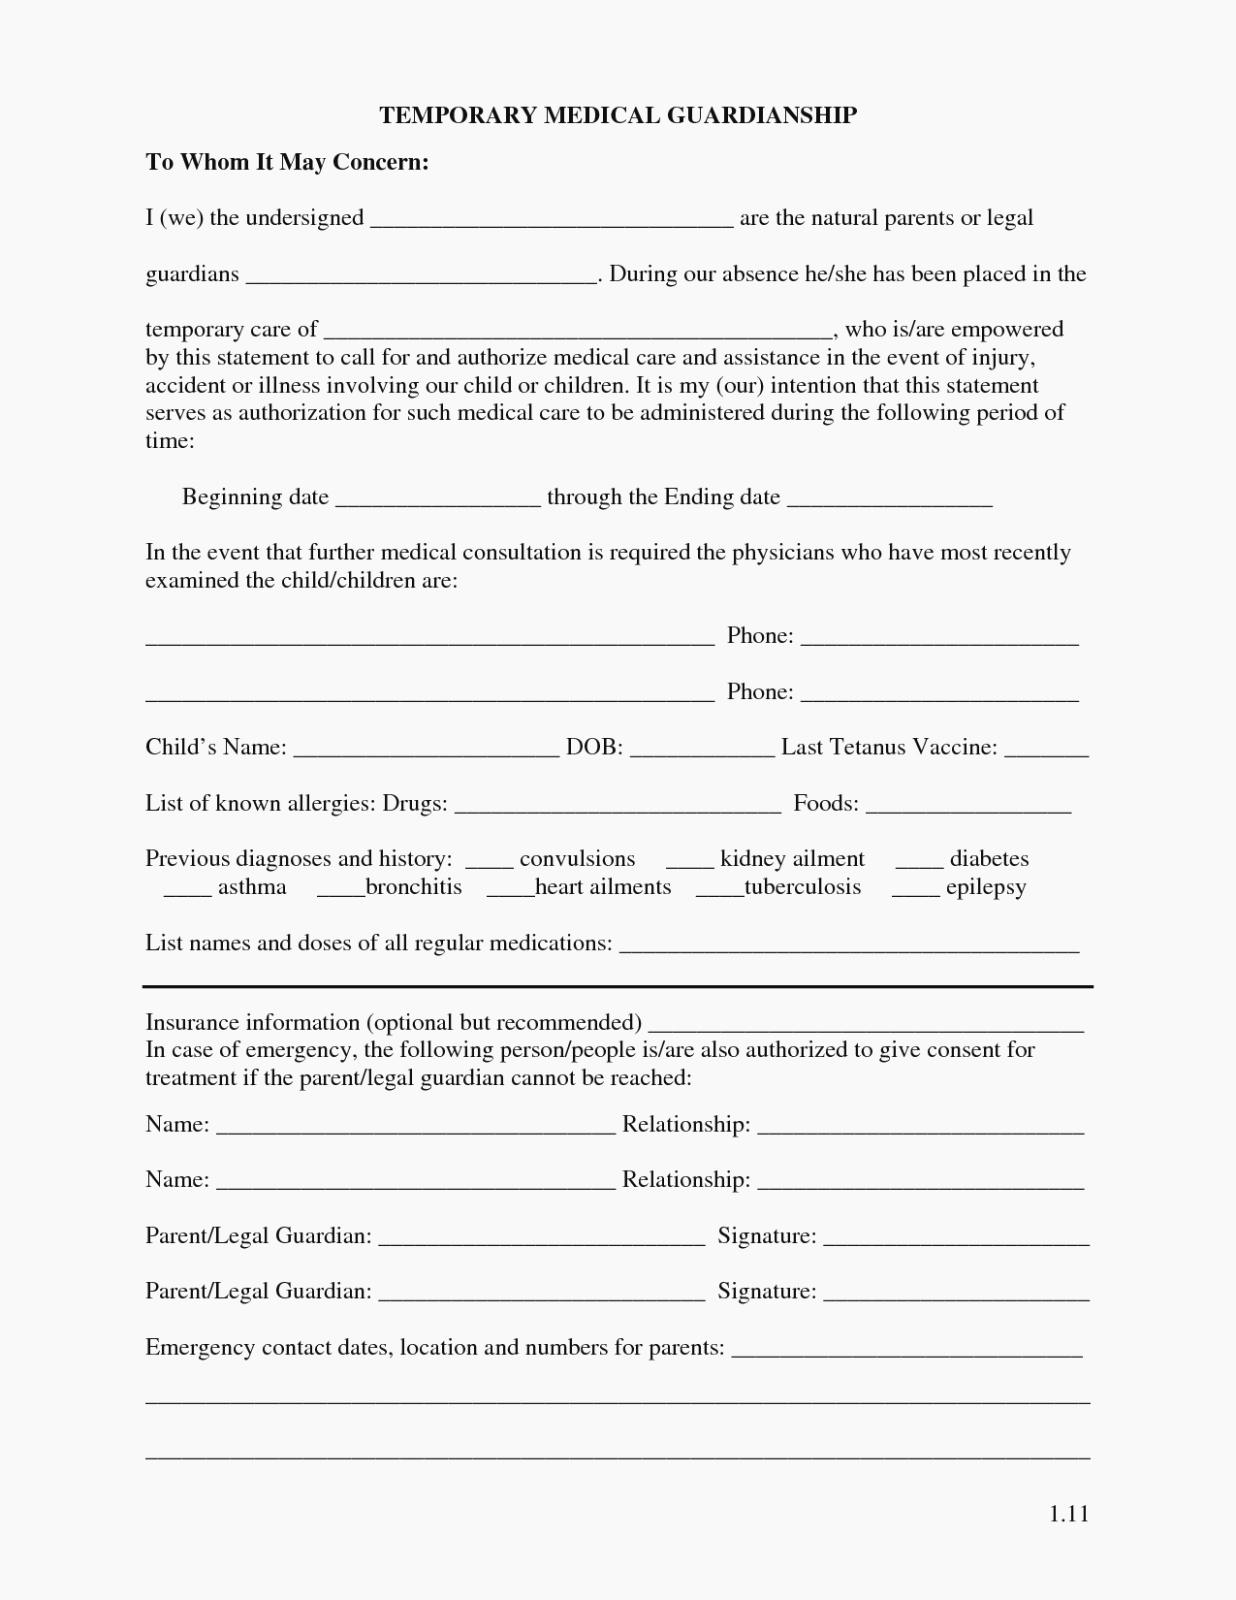 Temporary Guardianship Agreement form Elegant attending Legal Temporary Custody